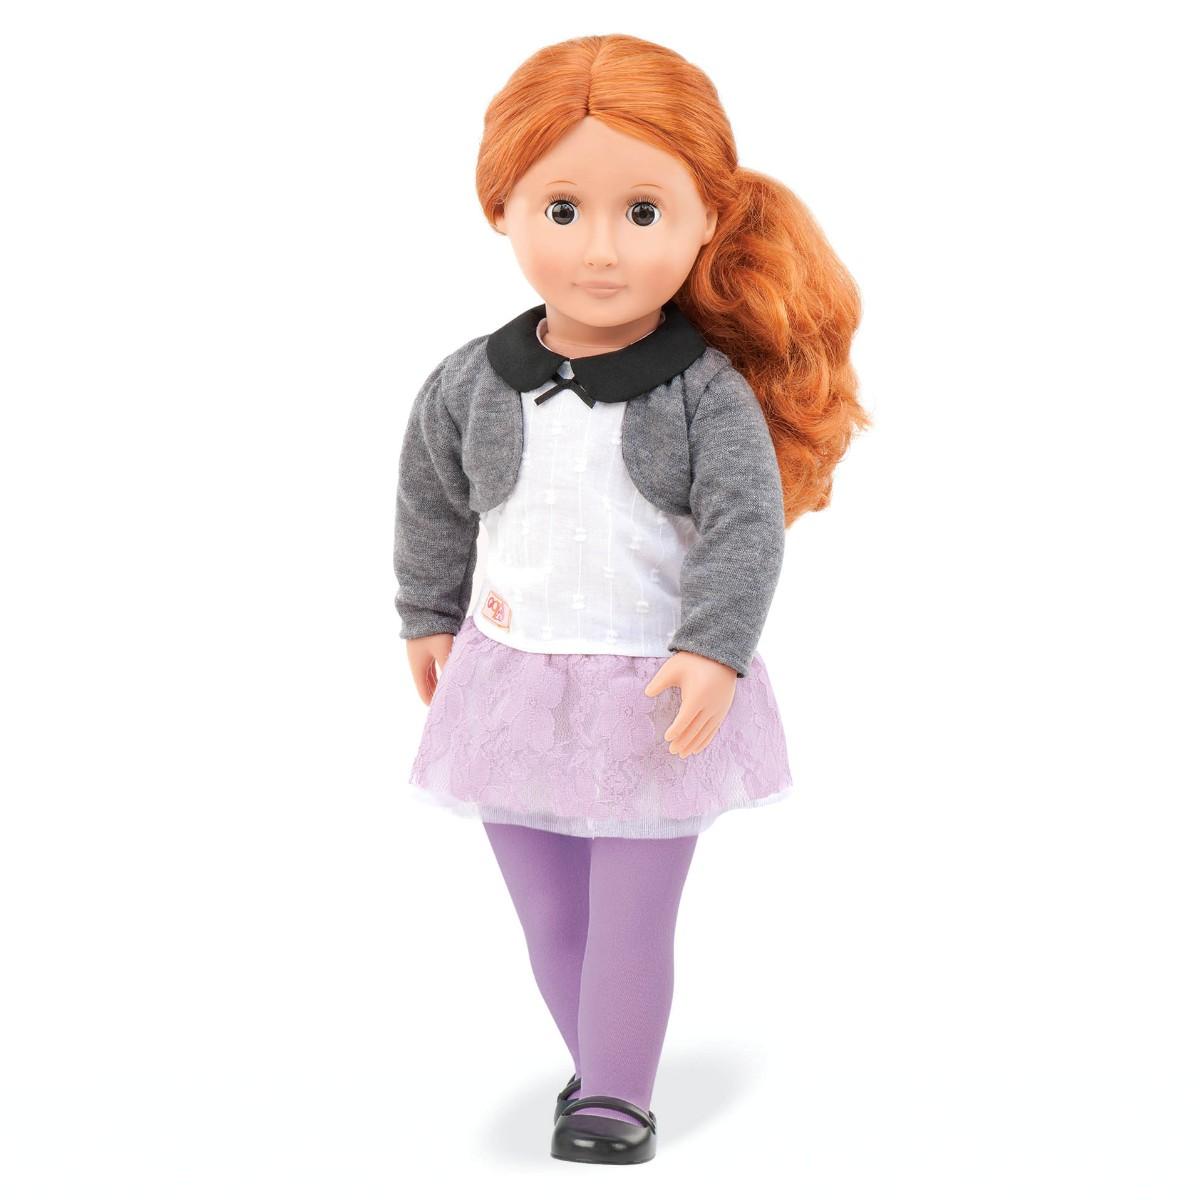 Our Generation - Ella Grace Doll (731047)